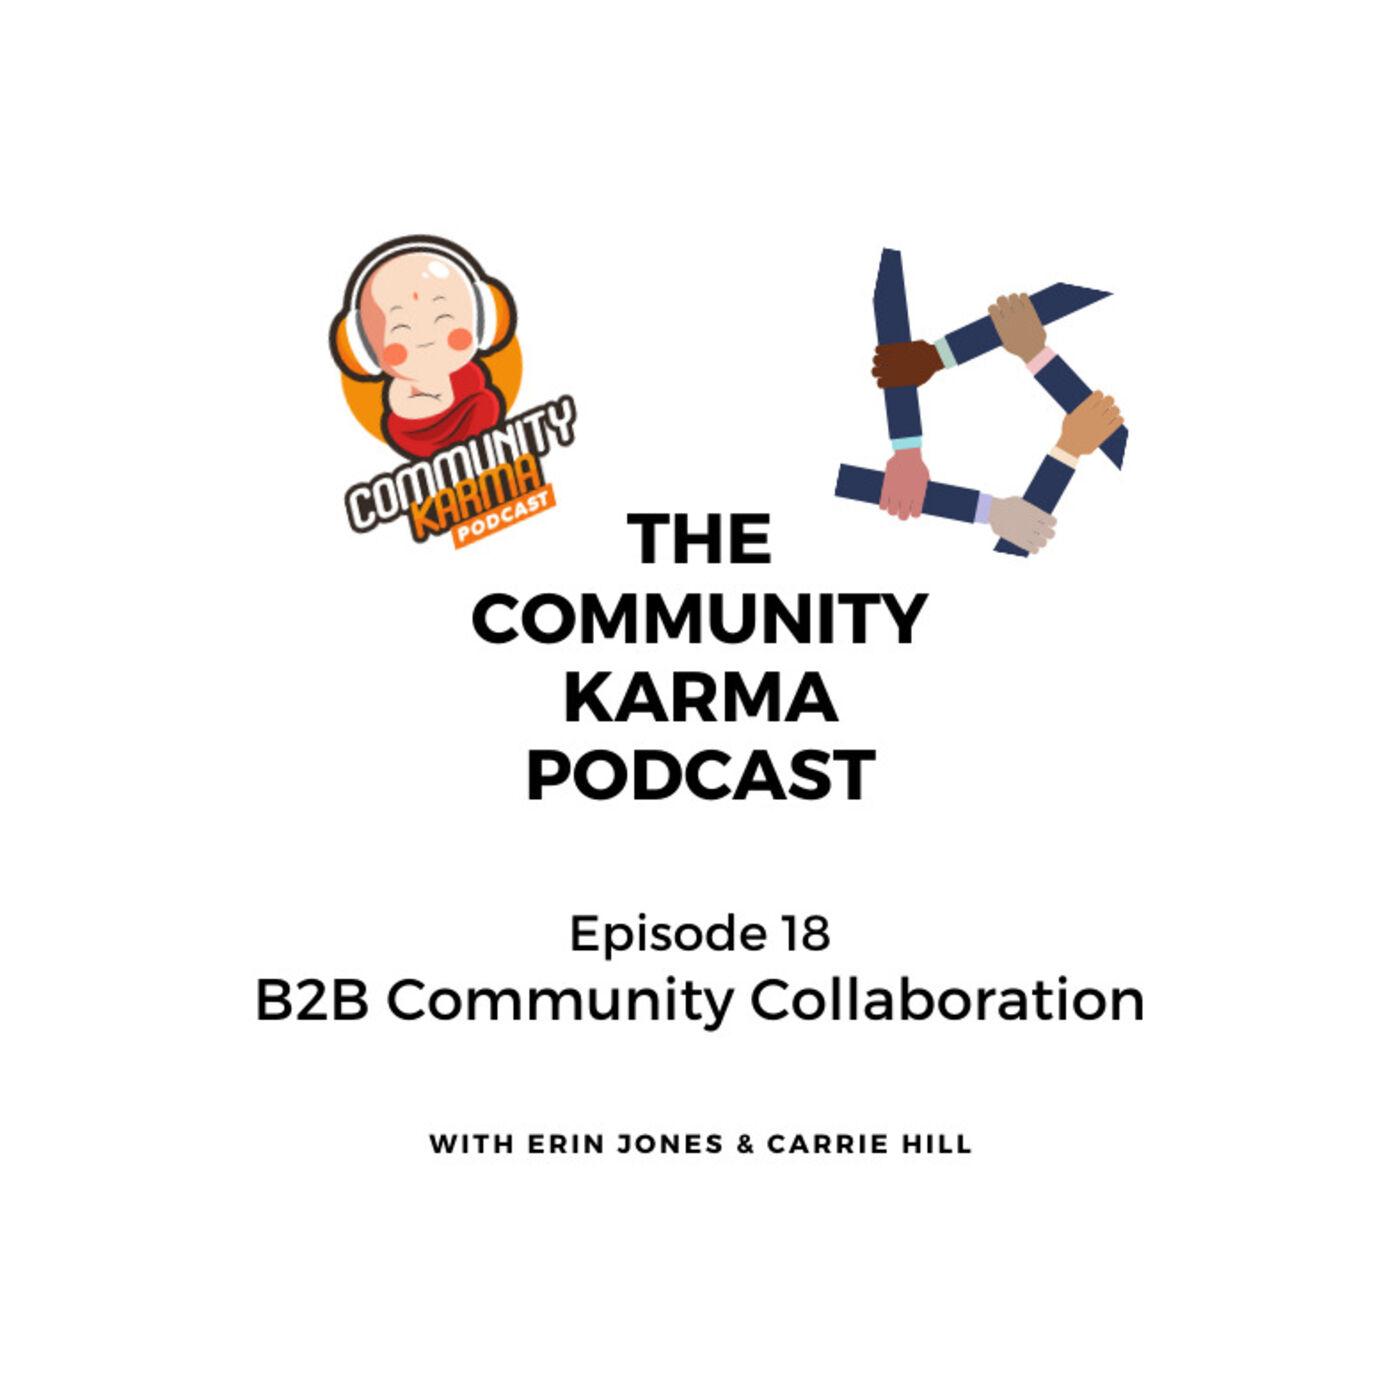 Episode 18: B2B Community Collaboration